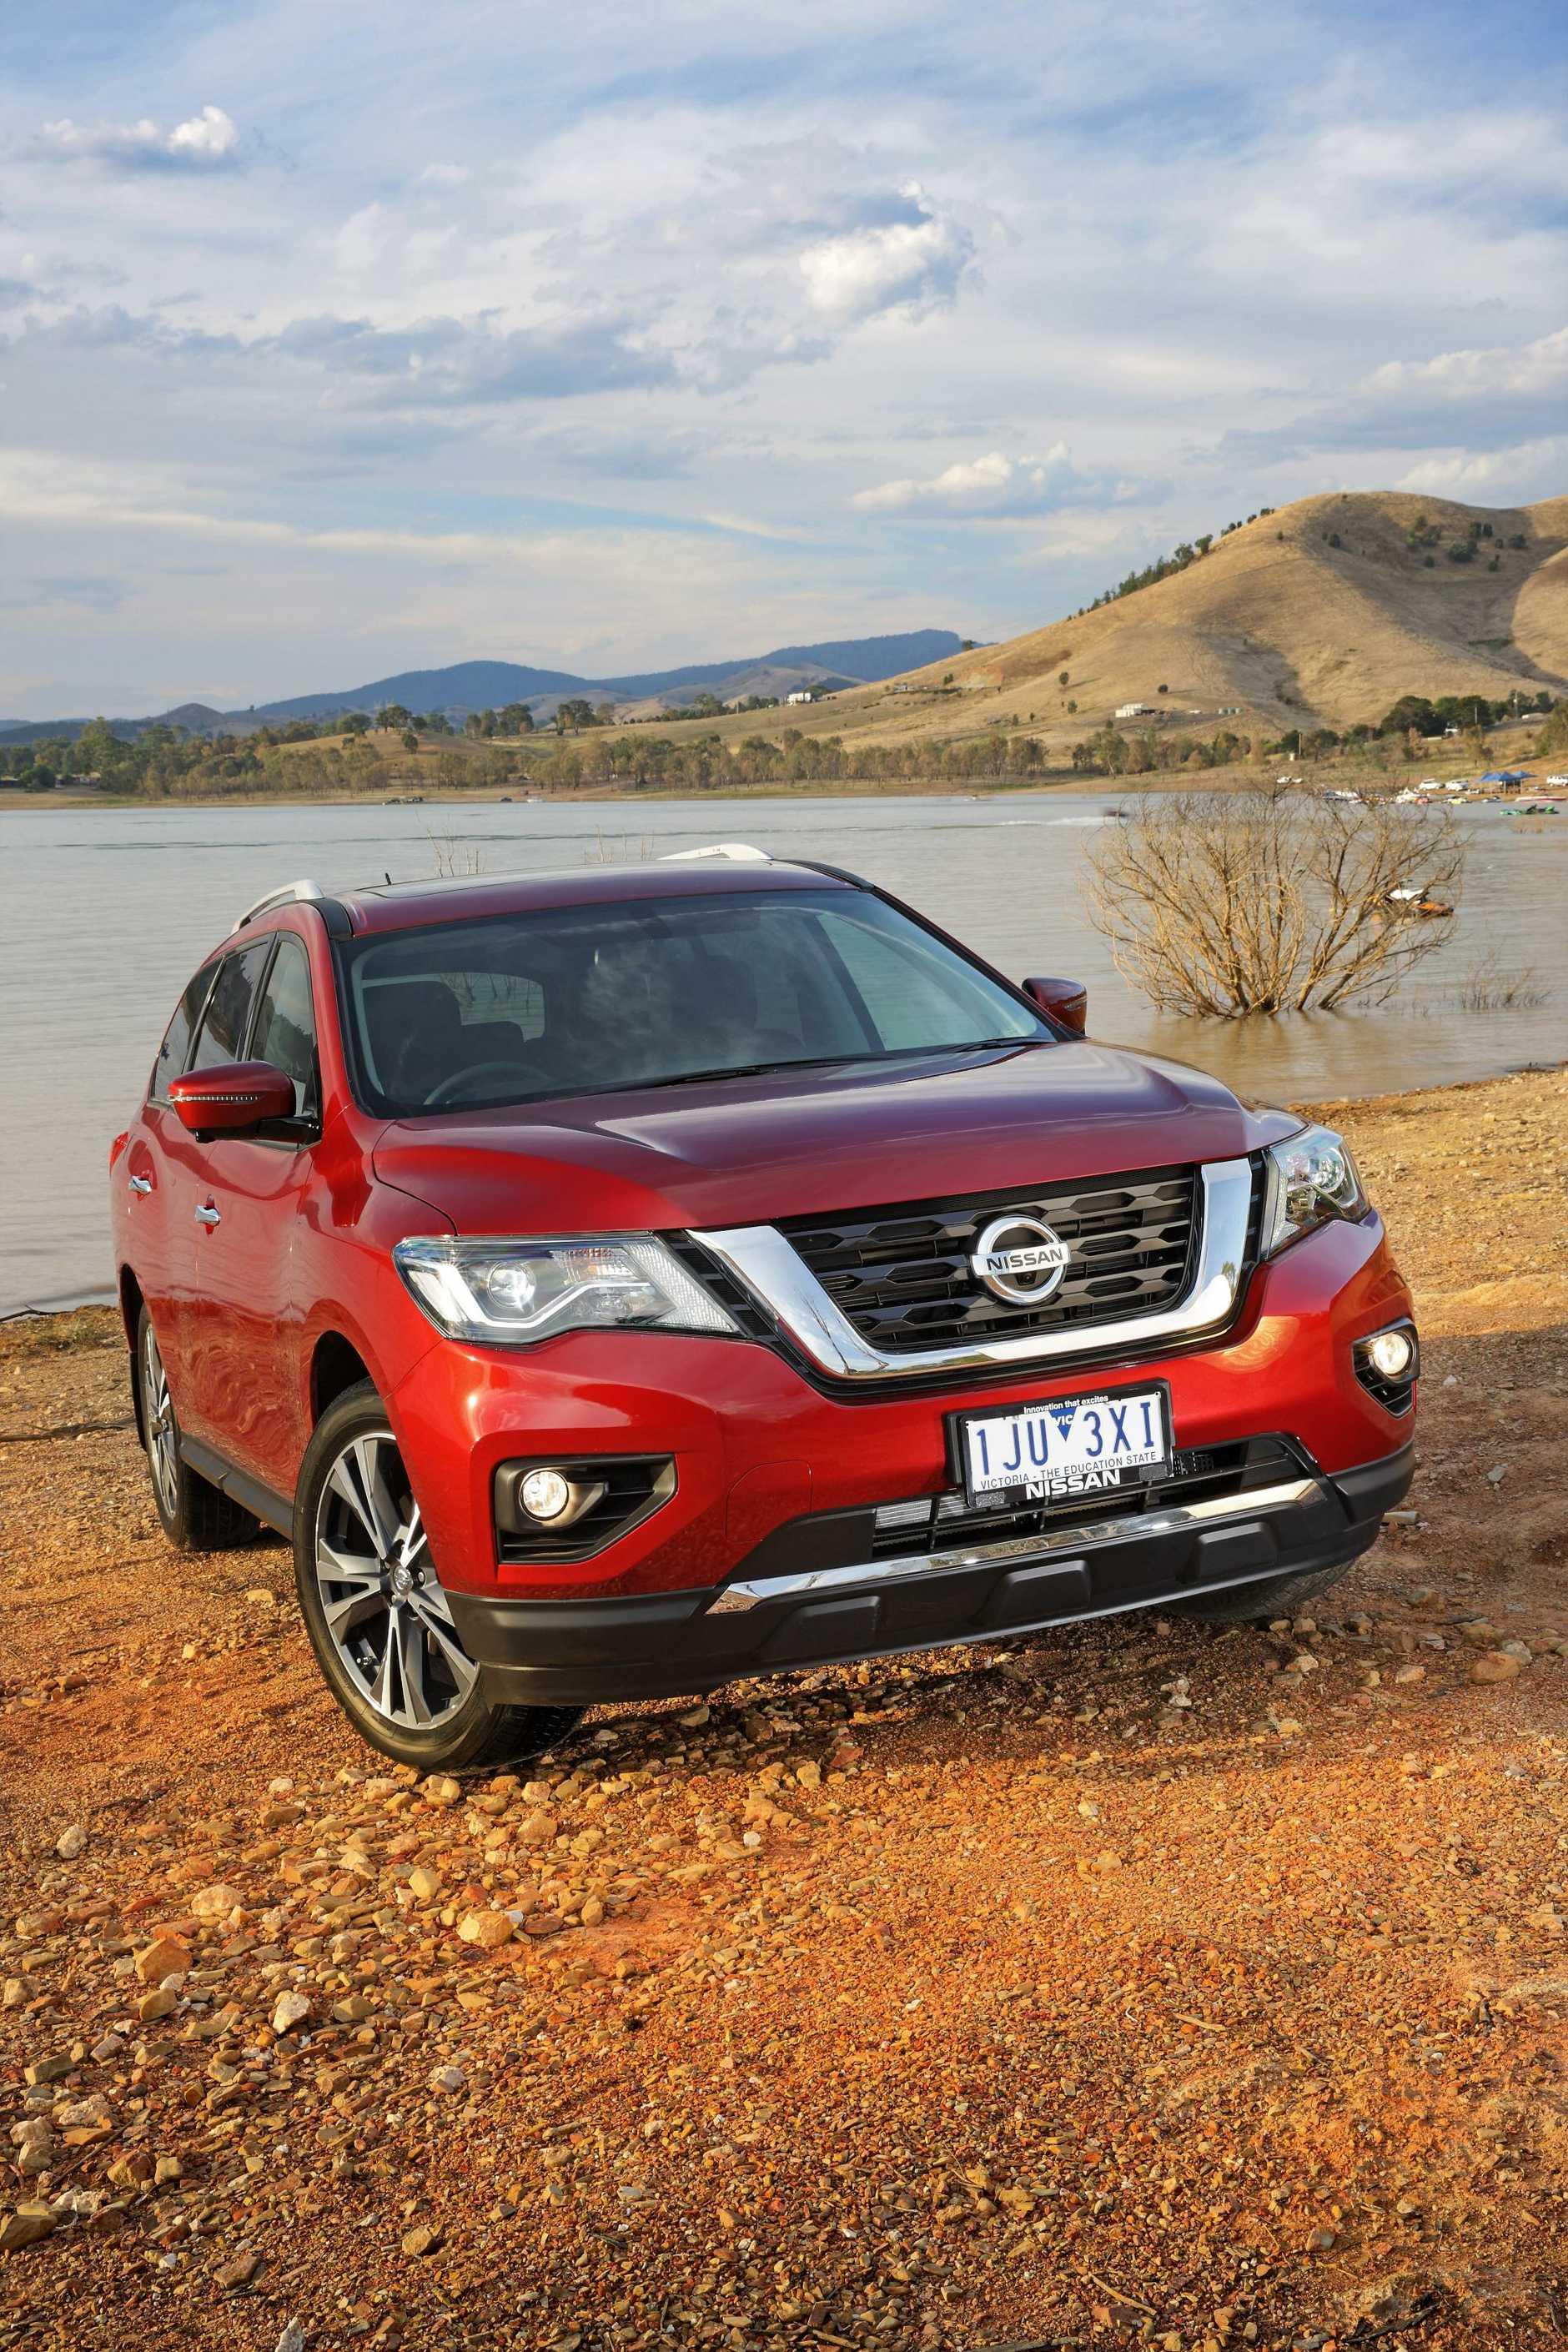 HEAD TO HEAD: Nissan Pathfinder v Hyundai Santa Fe